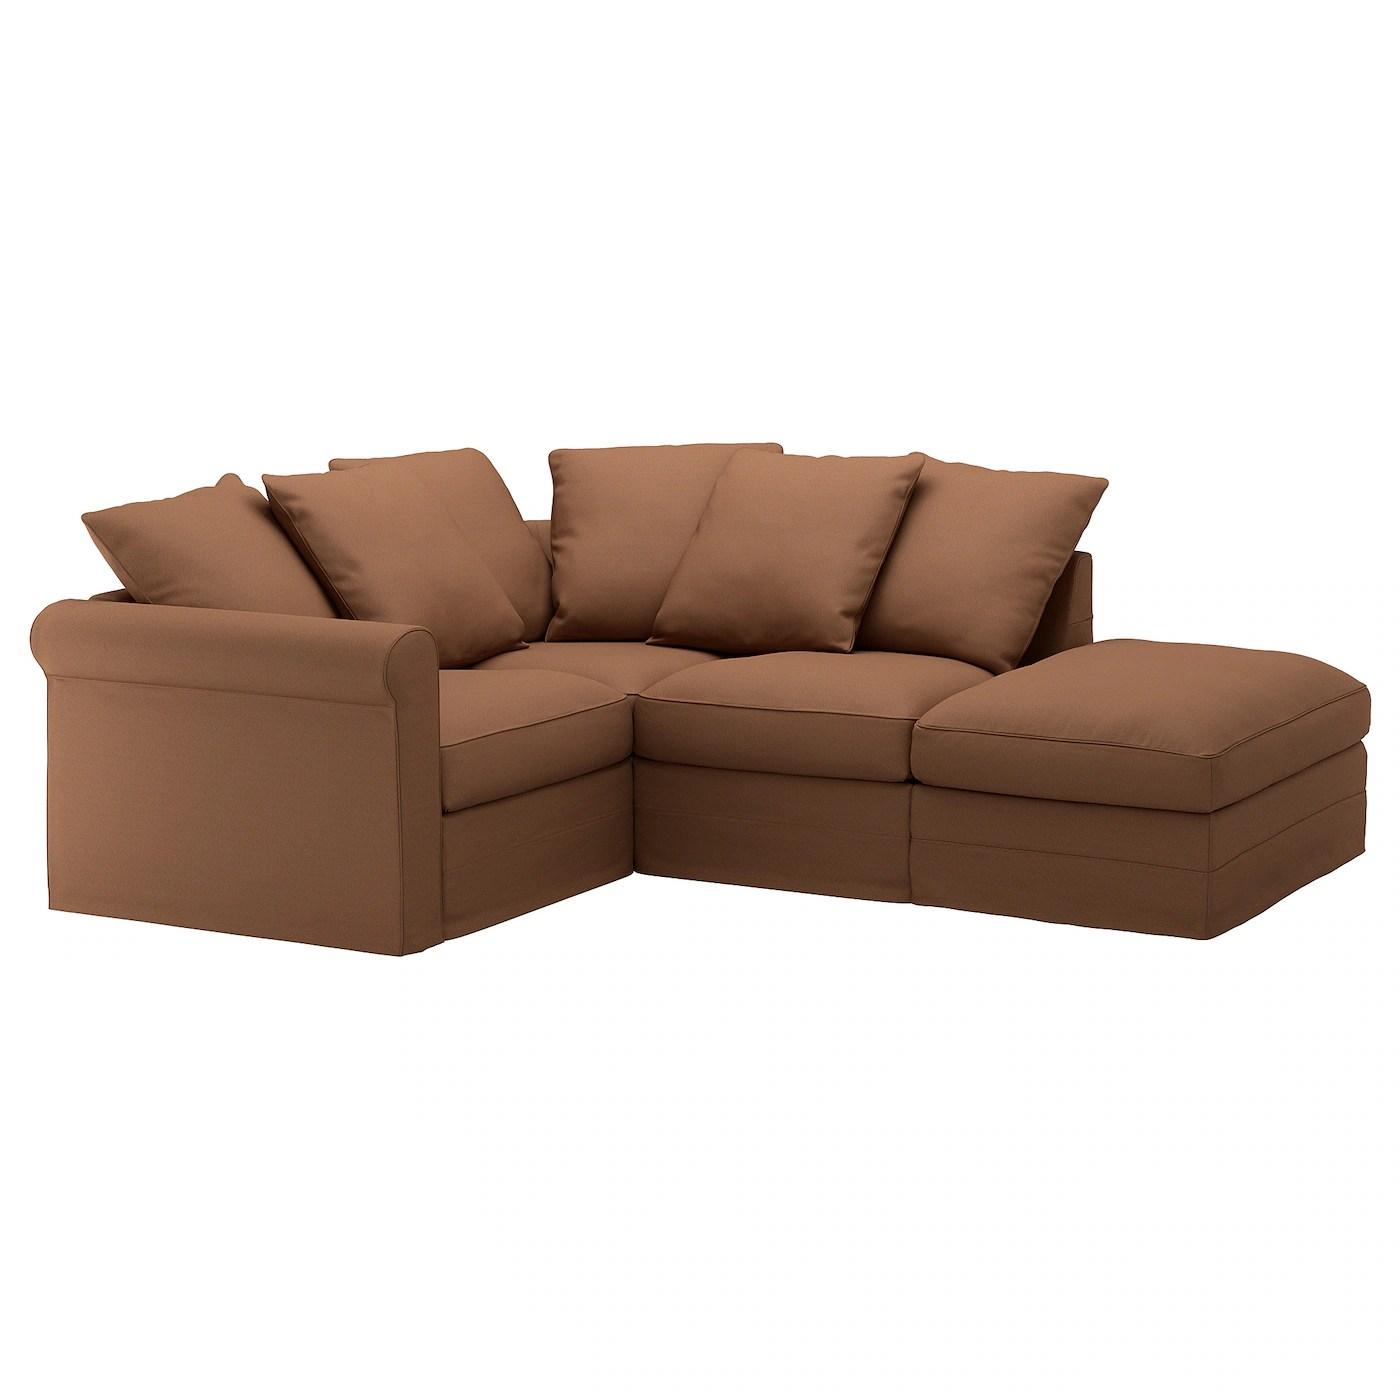 corner sofa bed dublin blue furniture village beds review home co